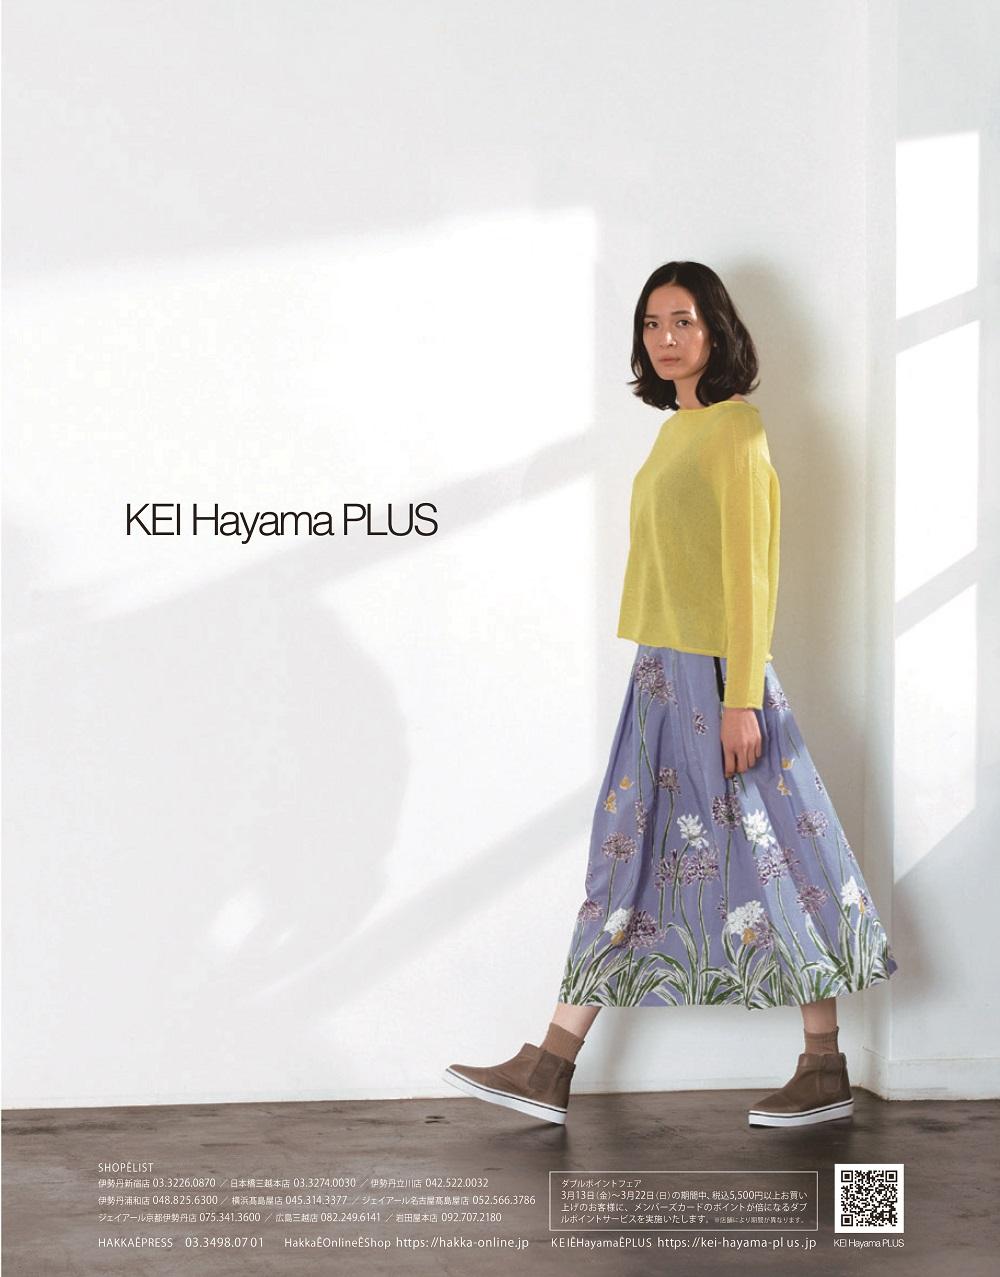 KEI_Hayama_PLUS_クロワッサン_2020.3.10発売_雑誌広告_